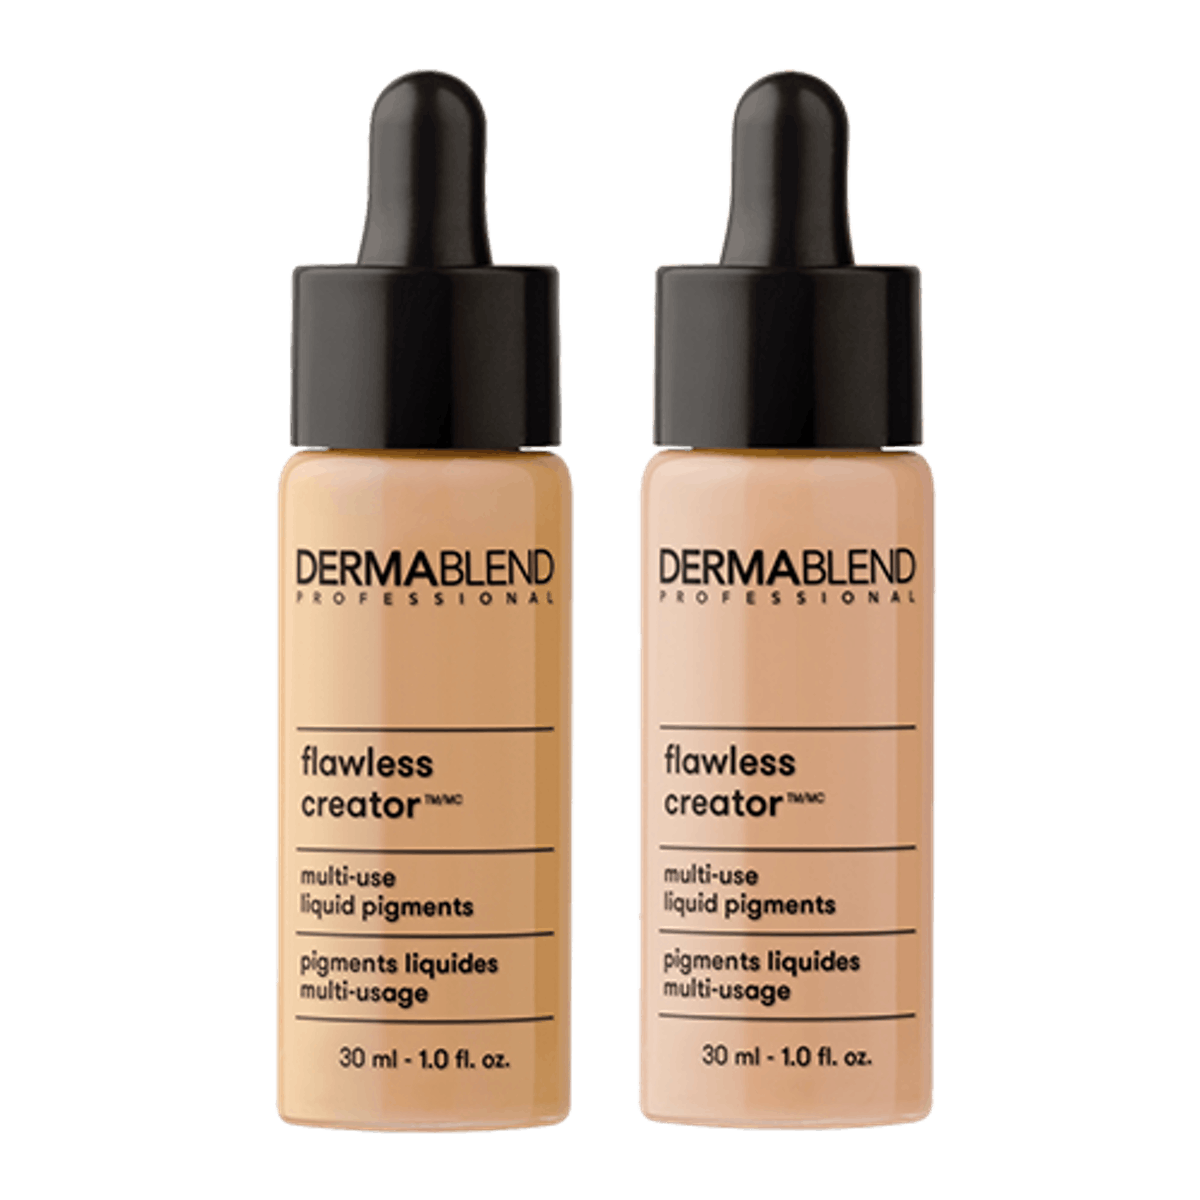 Dermablend Flawless Creator Multi-Use Liquid Foundation Drops